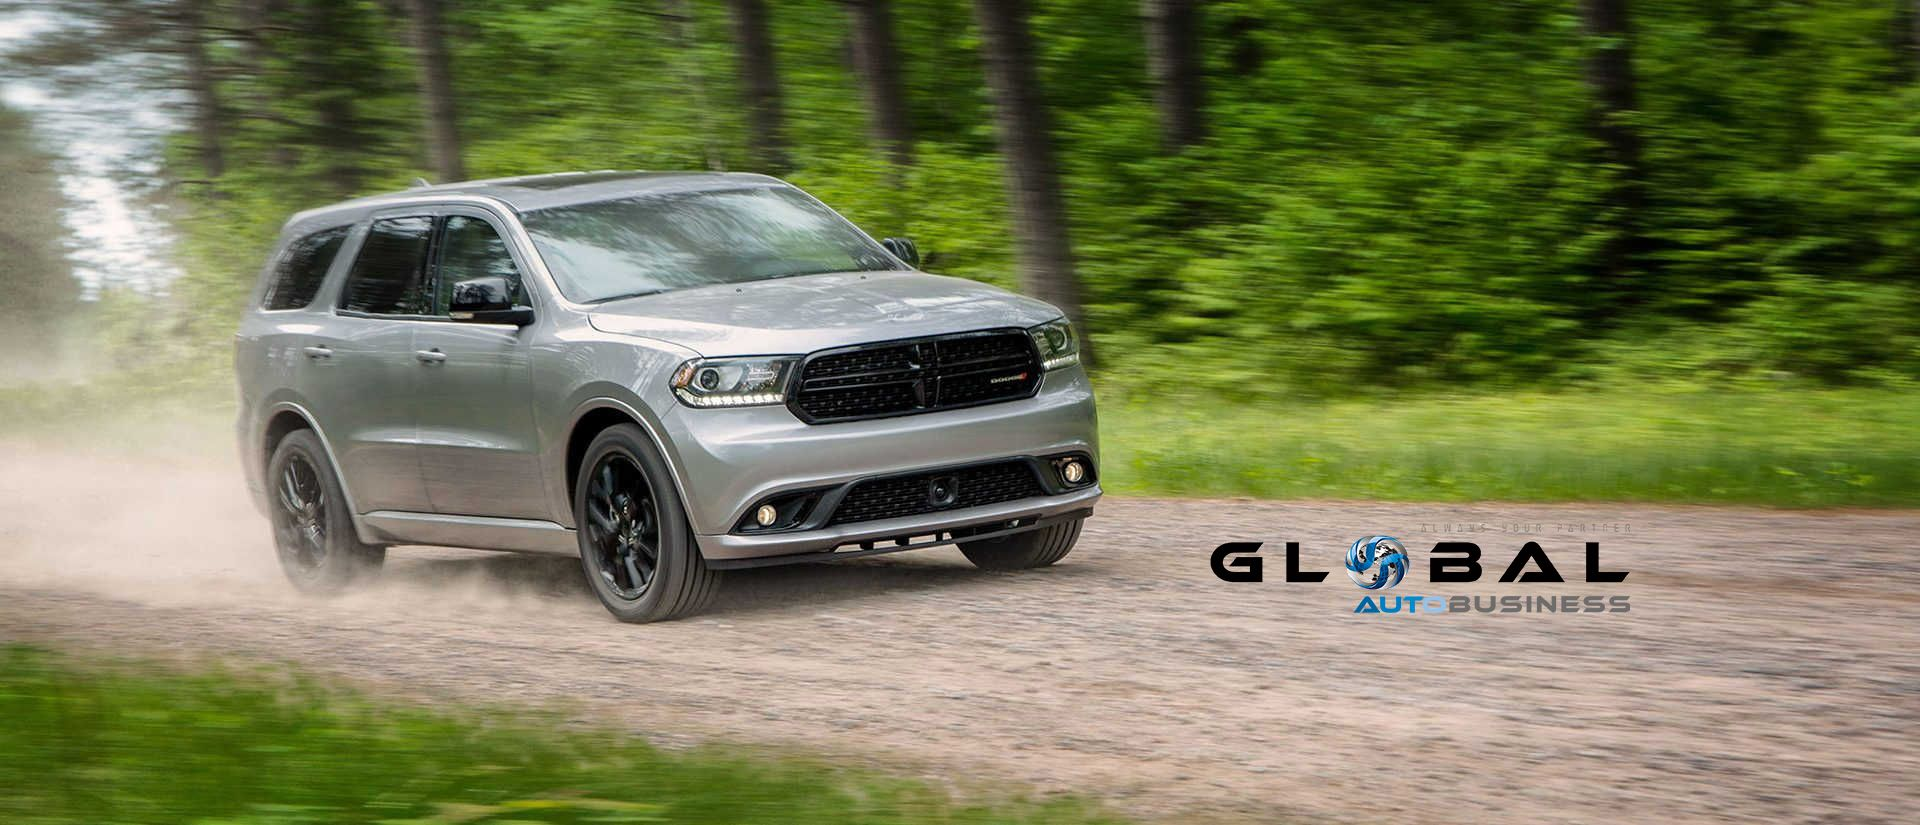 Global Auto Business Auto Business Car Rental Auto